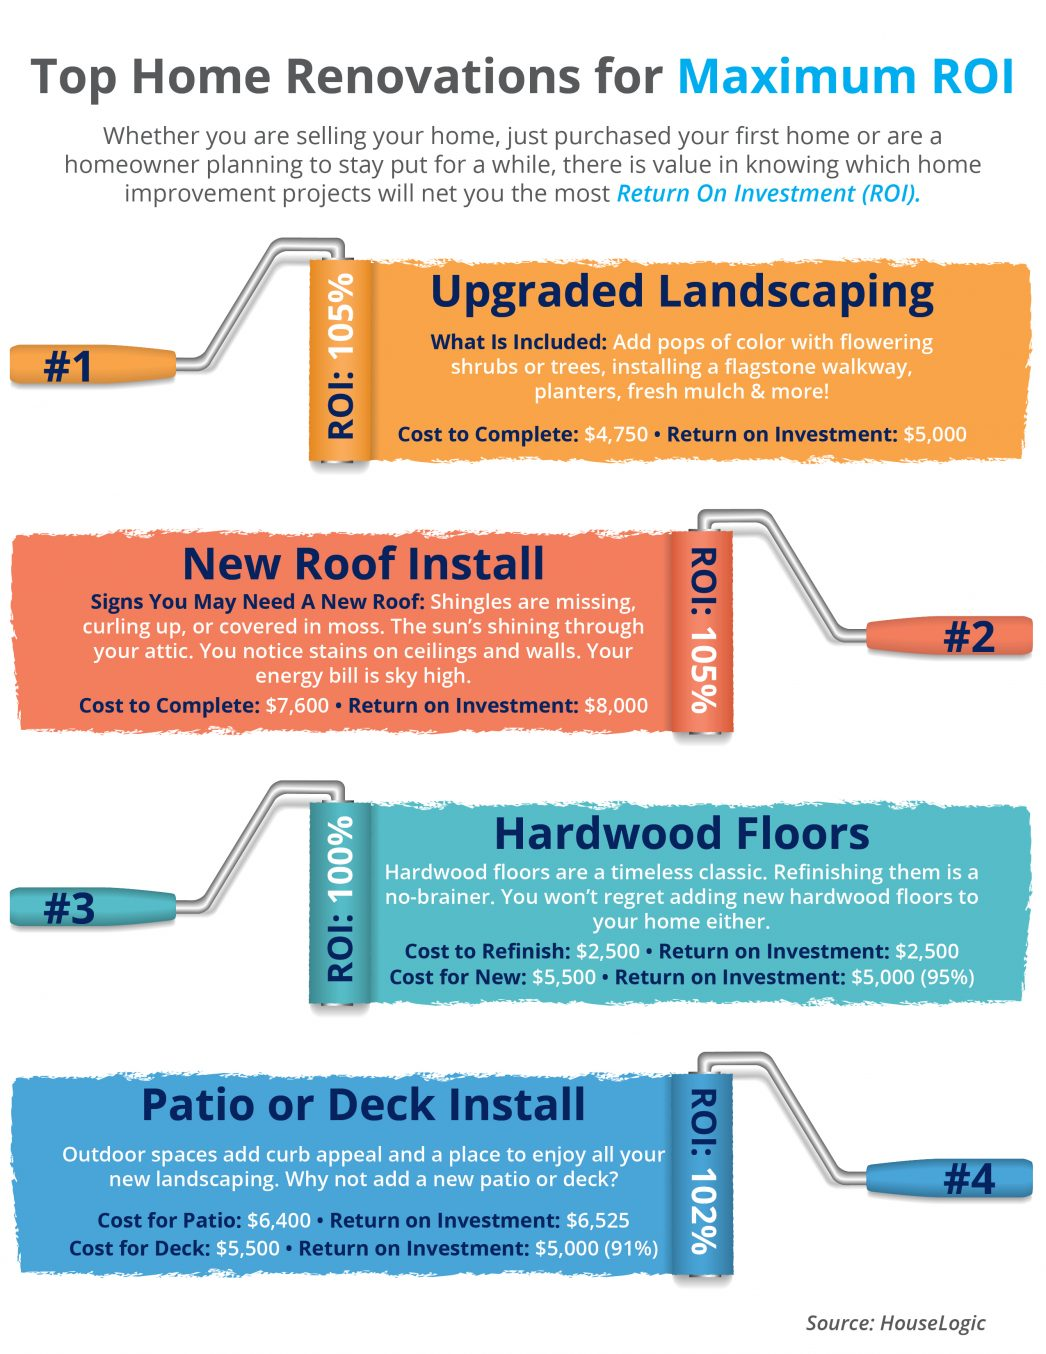 BP-Top-4-Home-Renovations-For-Maximum-ROI.jpg